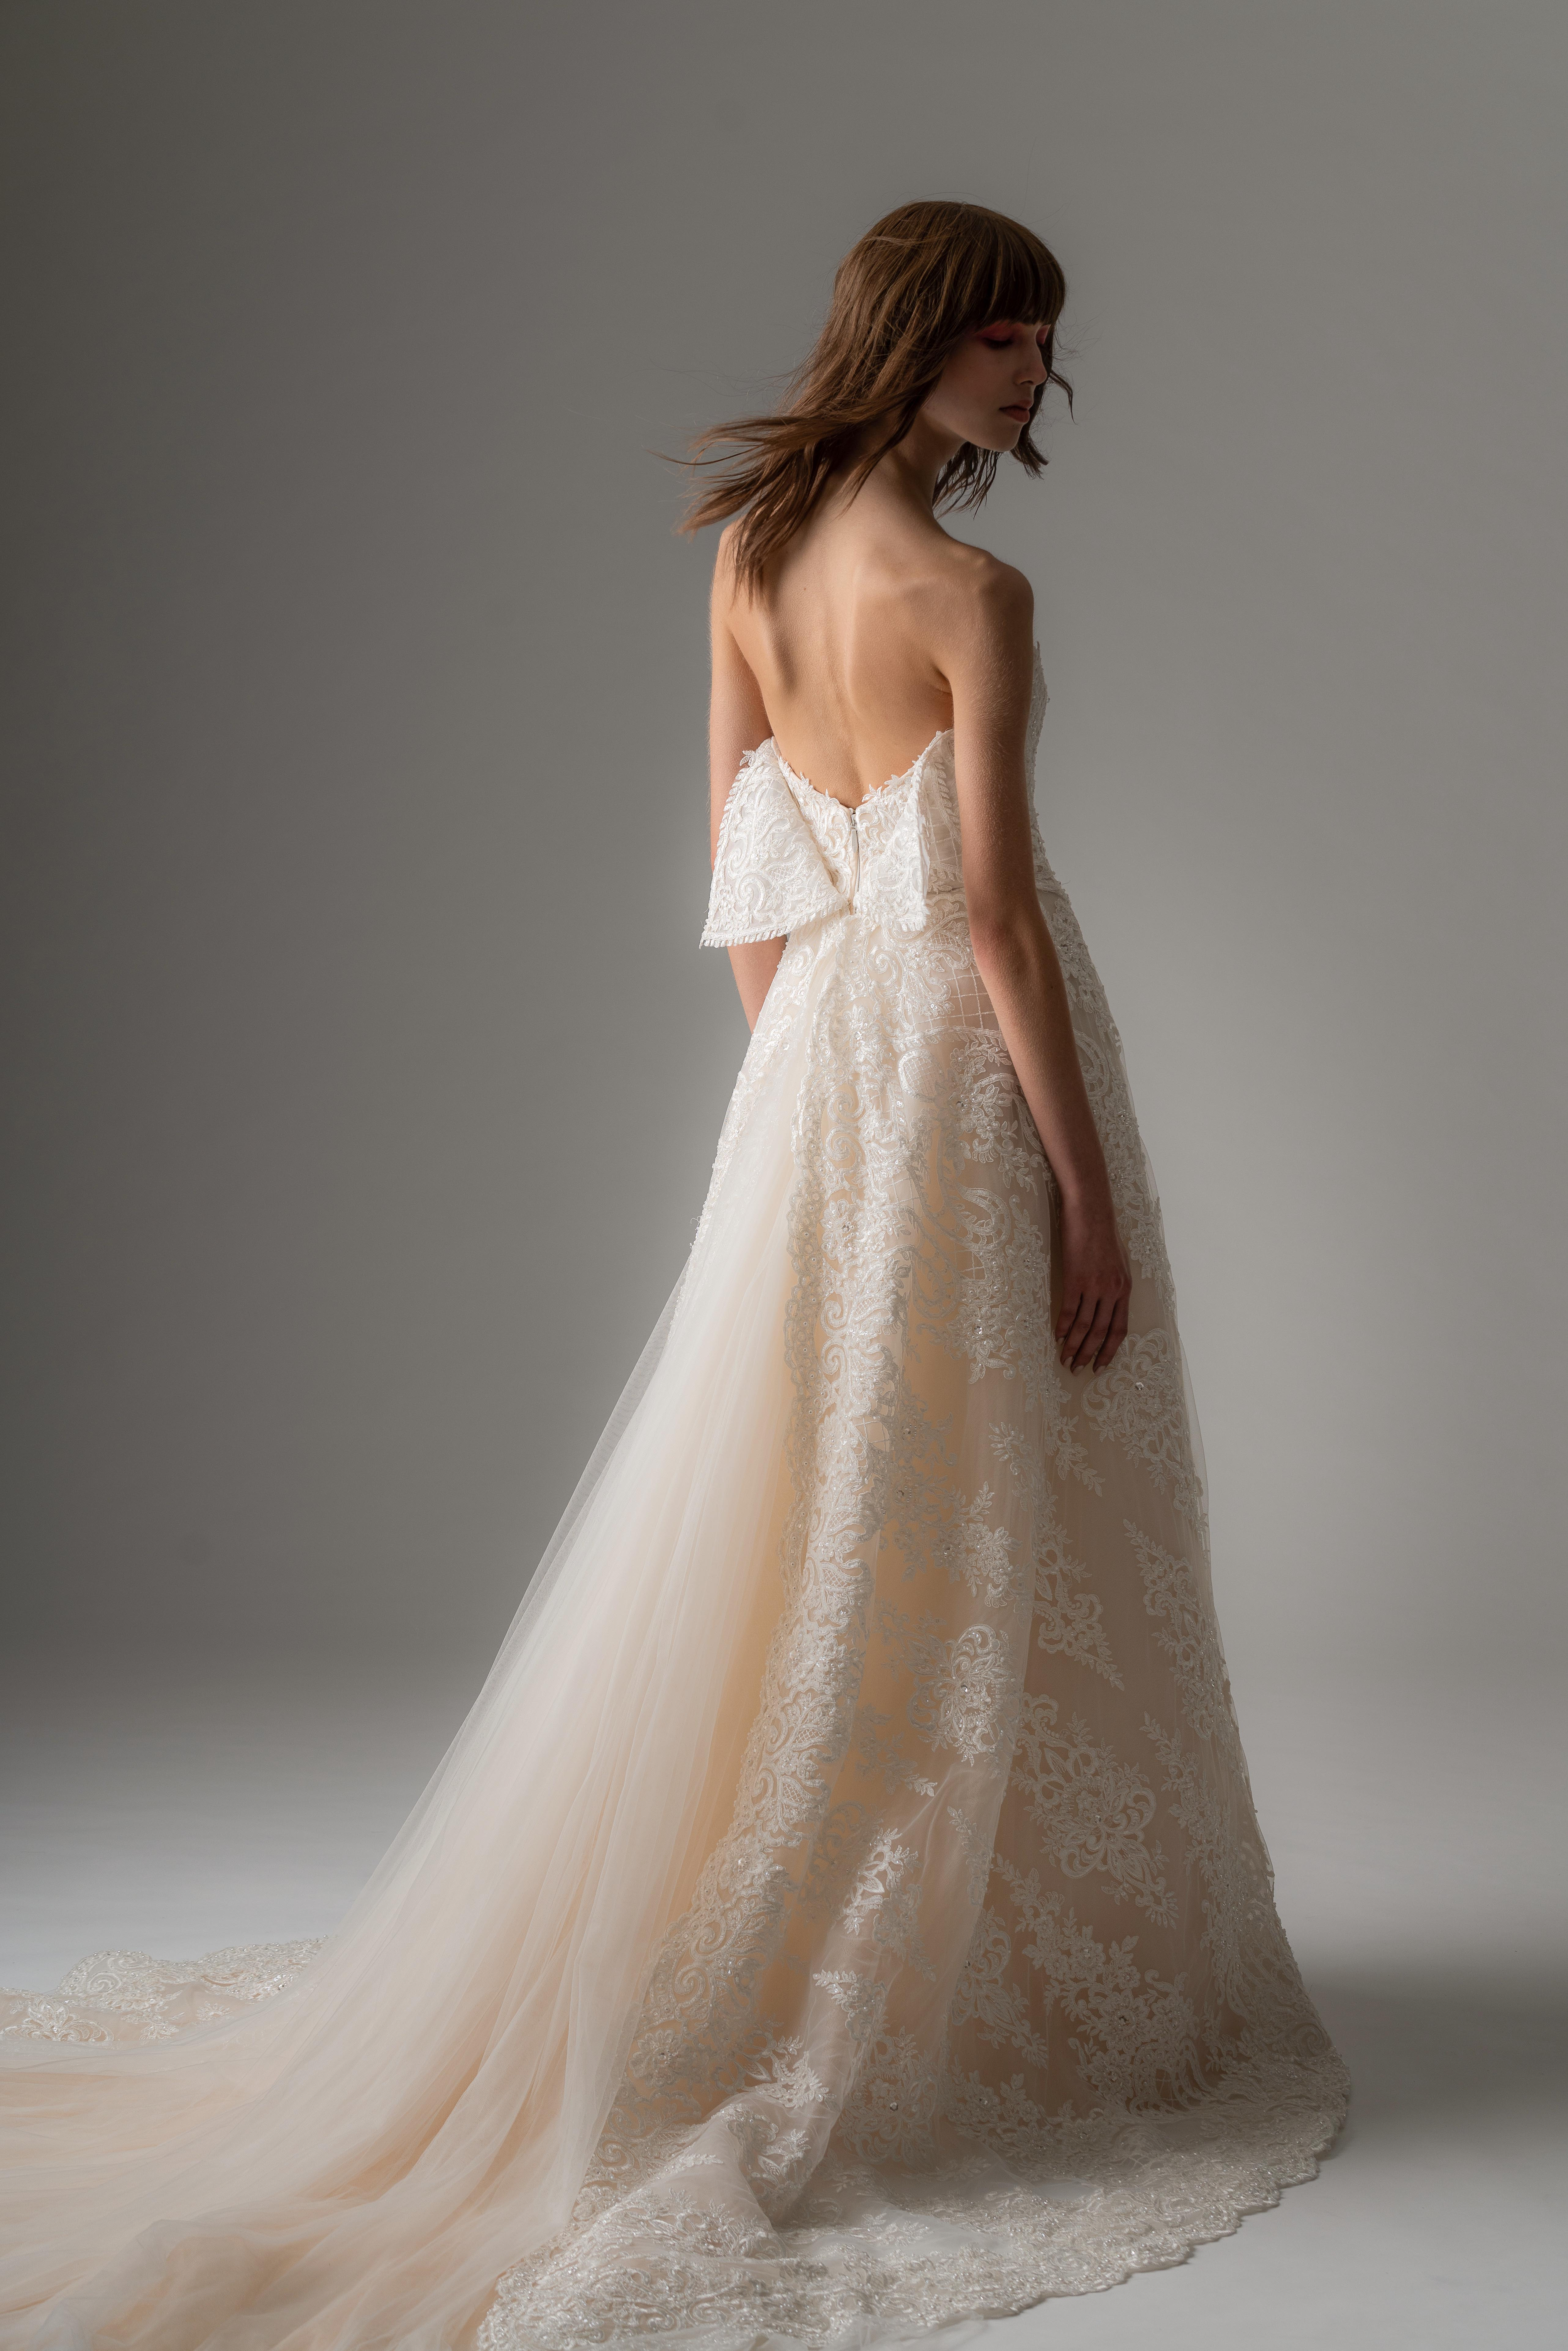 rivini by rita fall 2019 floral applique a-line strapless wedding dress